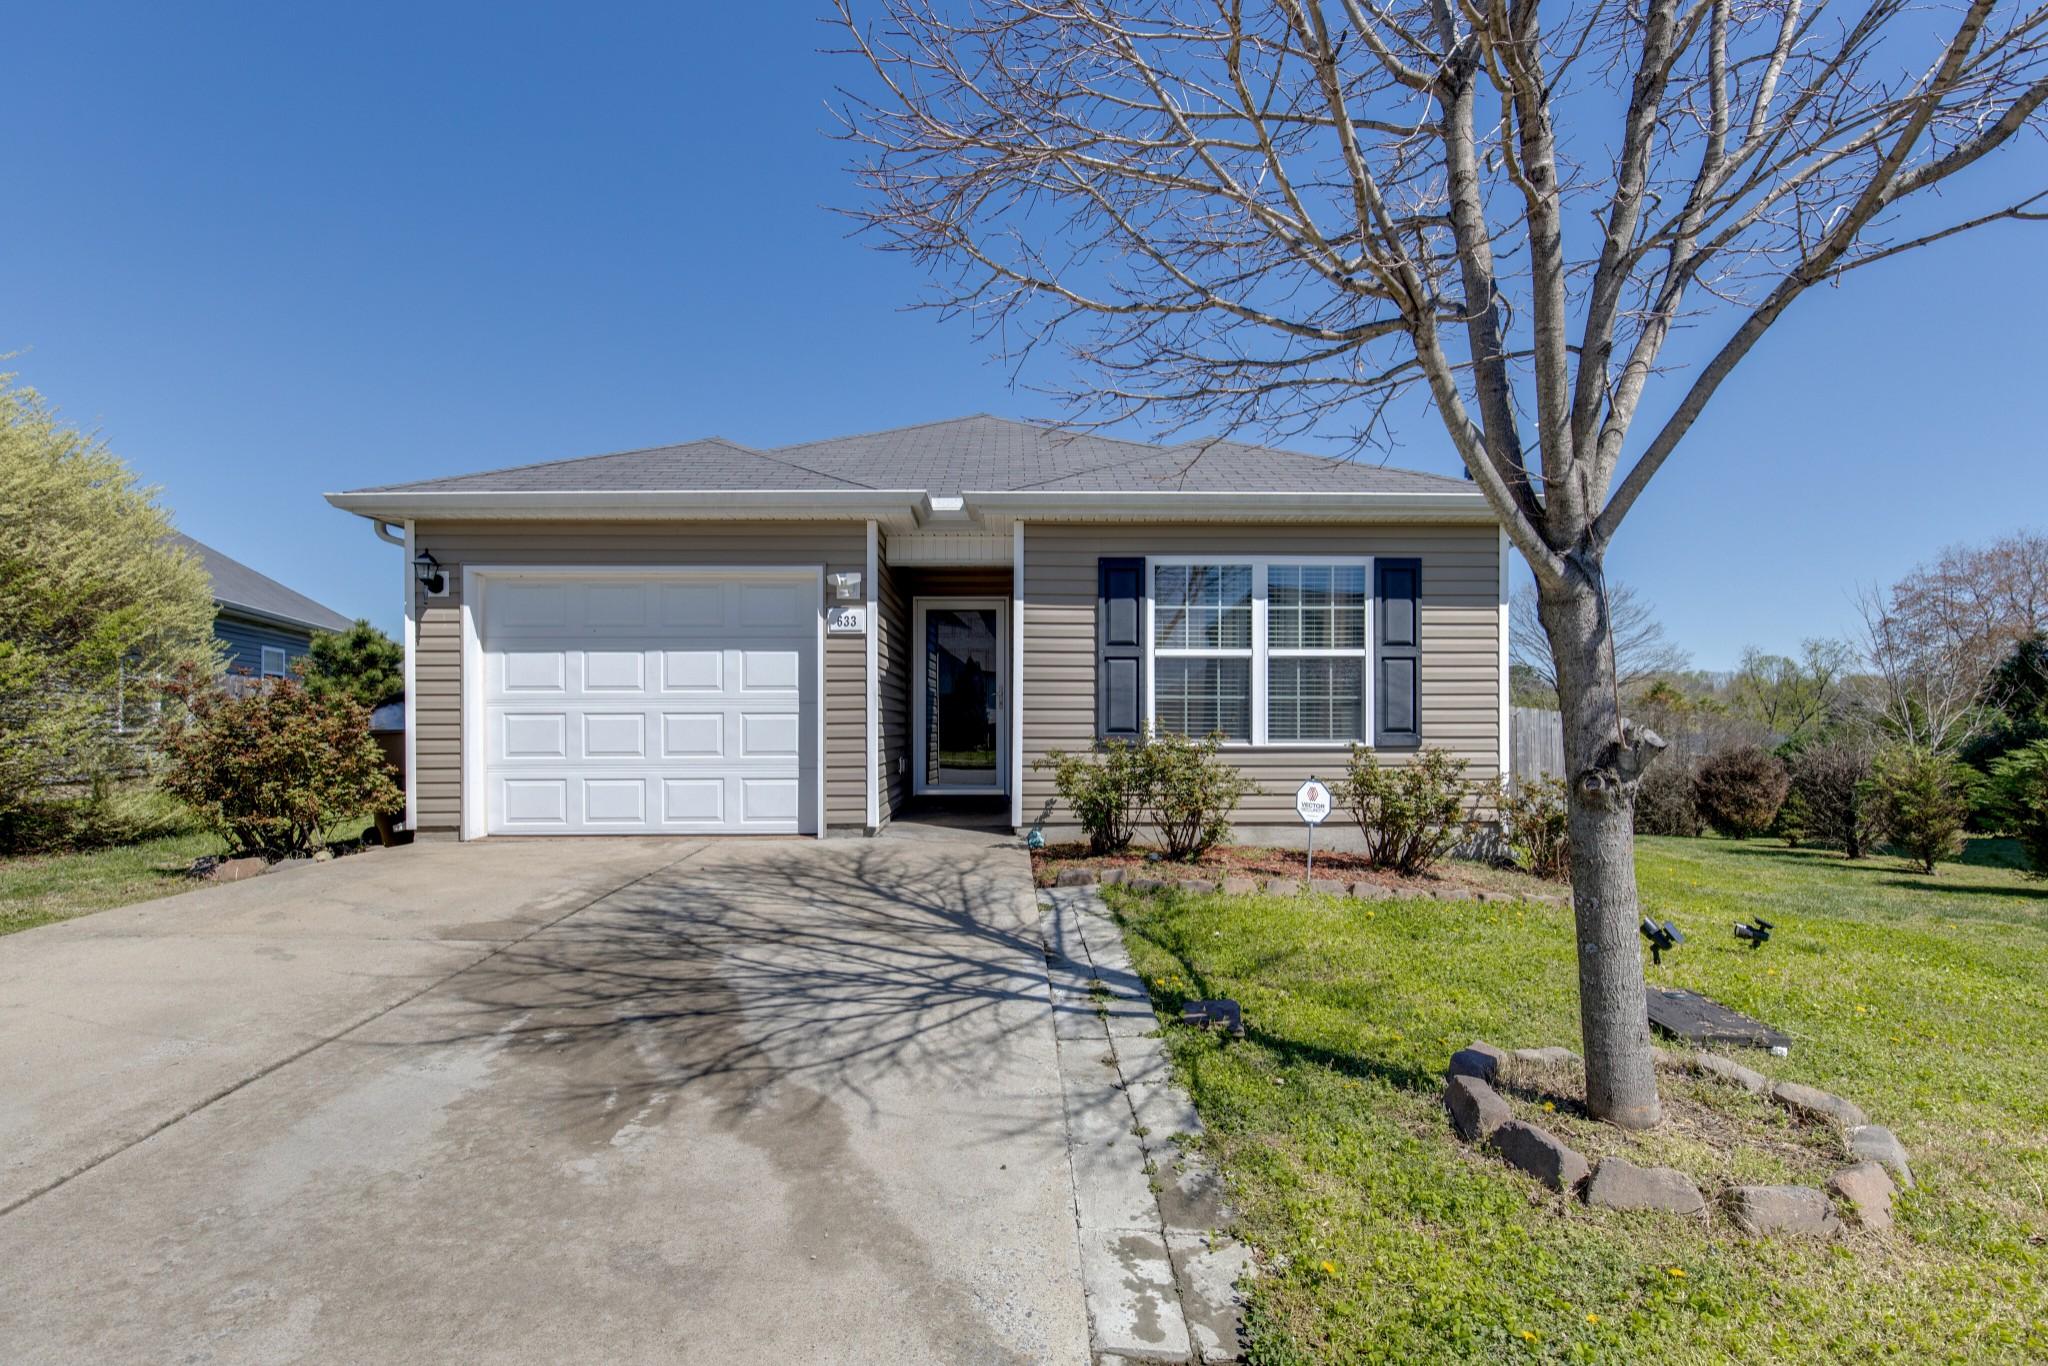 633 Hays Blackman Loop Property Photo - Antioch, TN real estate listing